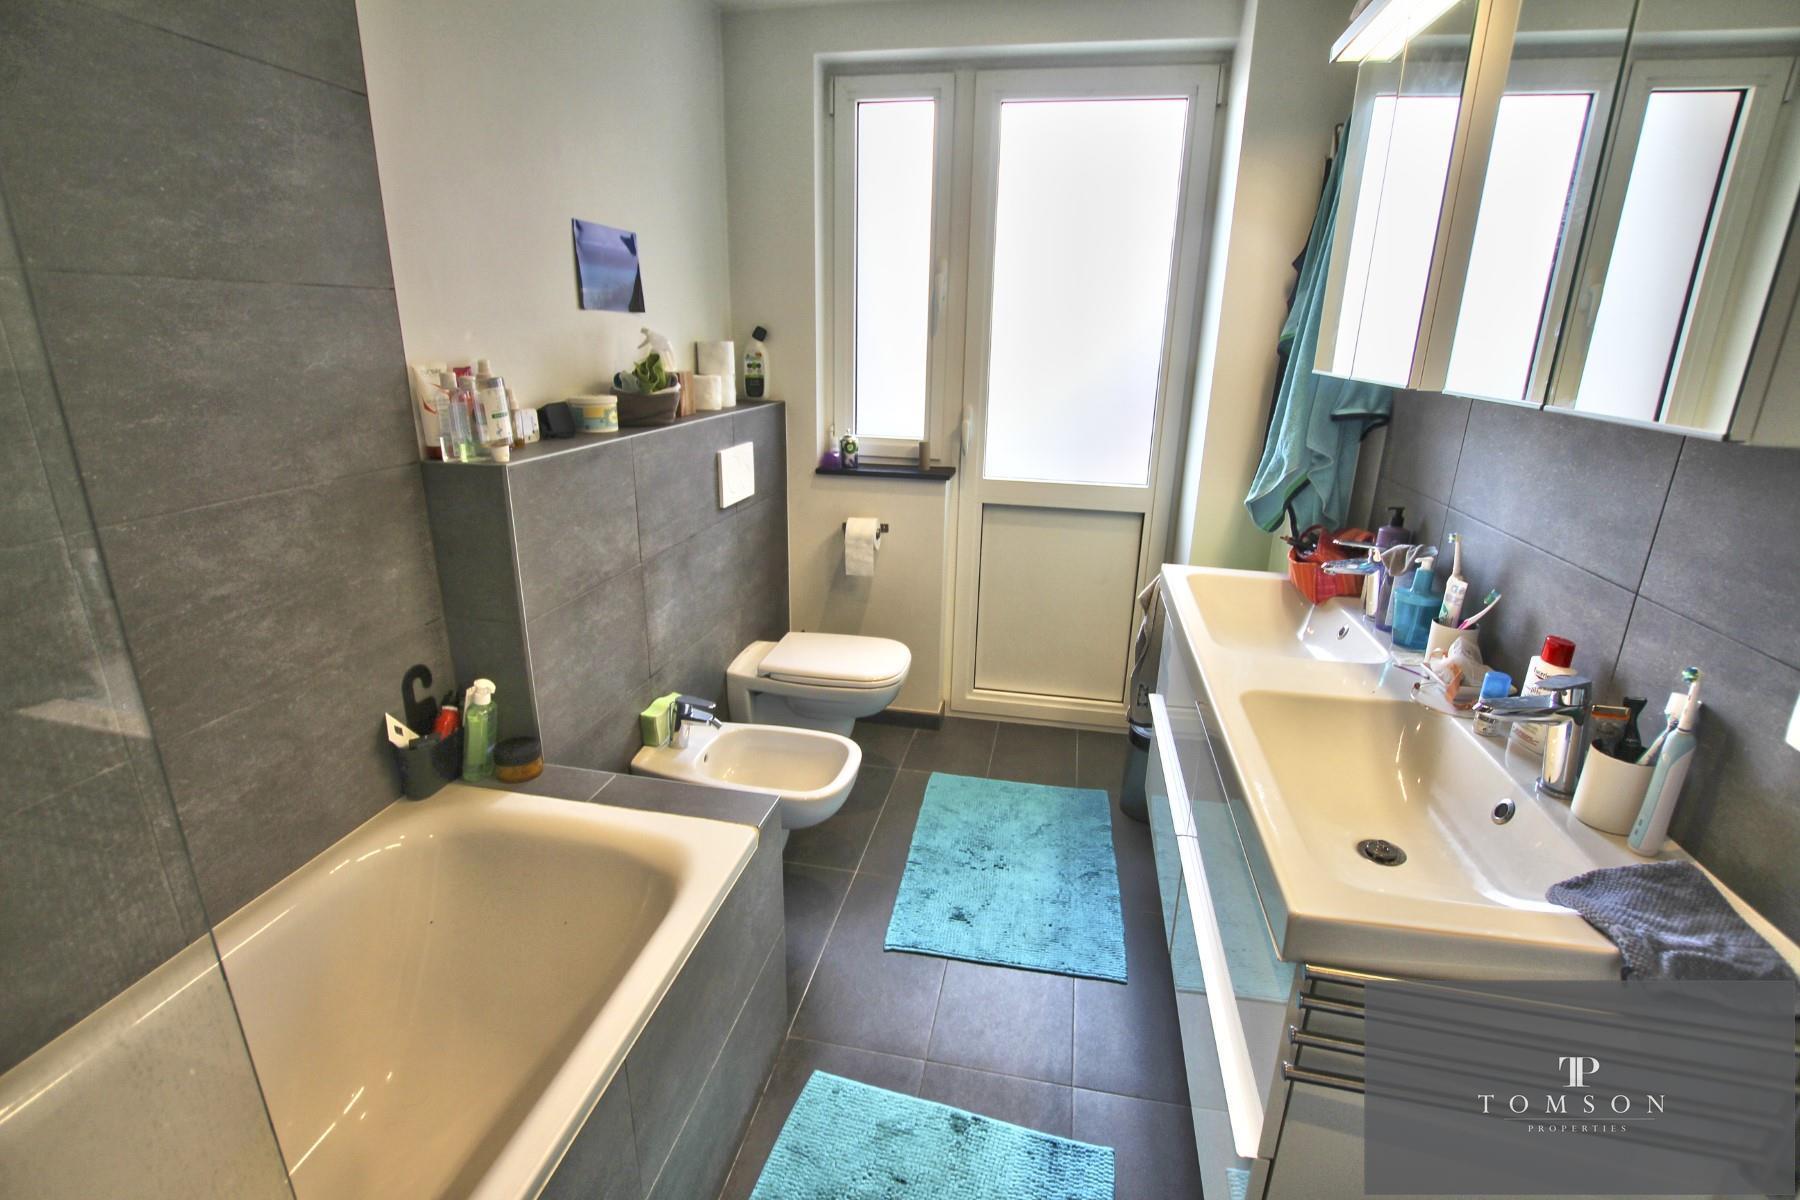 Appartement exceptionnel - Woluwe-Saint-Pierre - #4349832-8